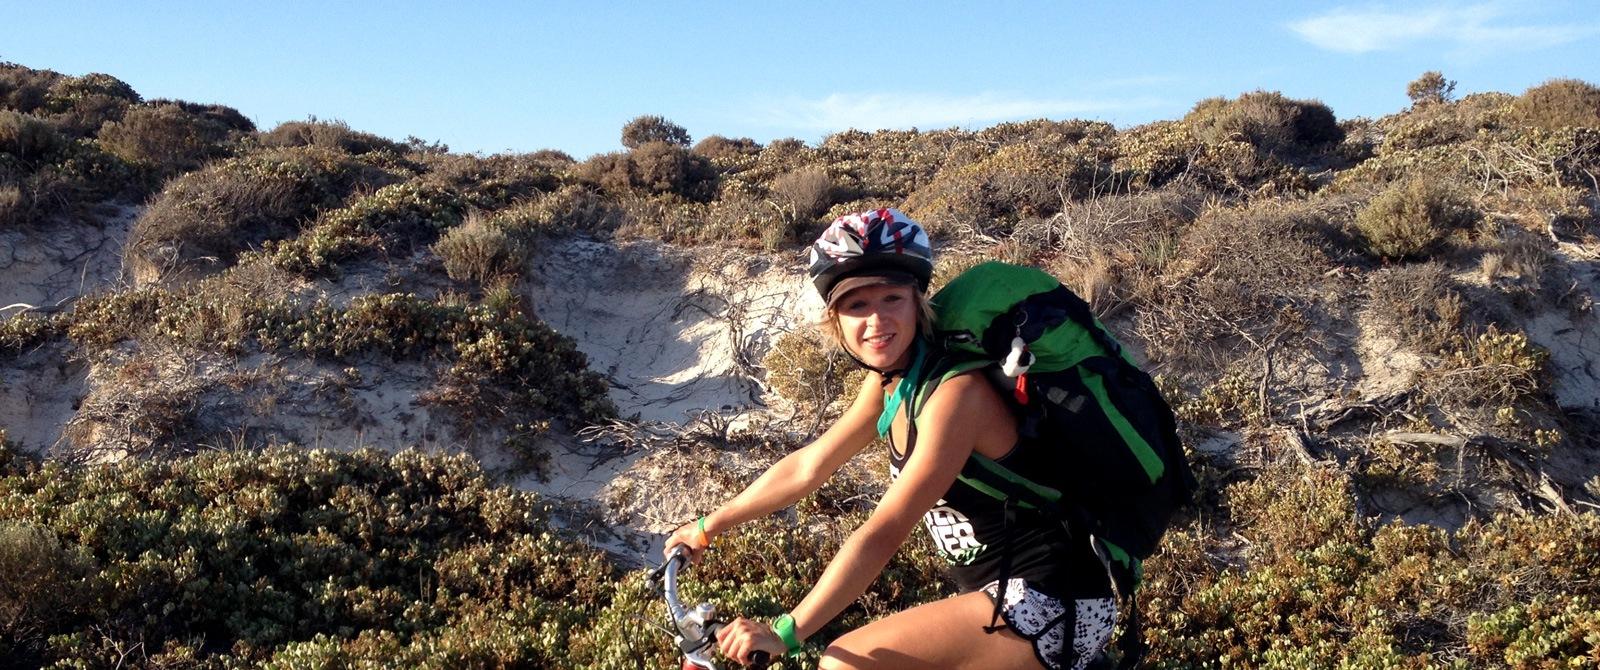 Trek Travel Cycling Guide Celine Welker